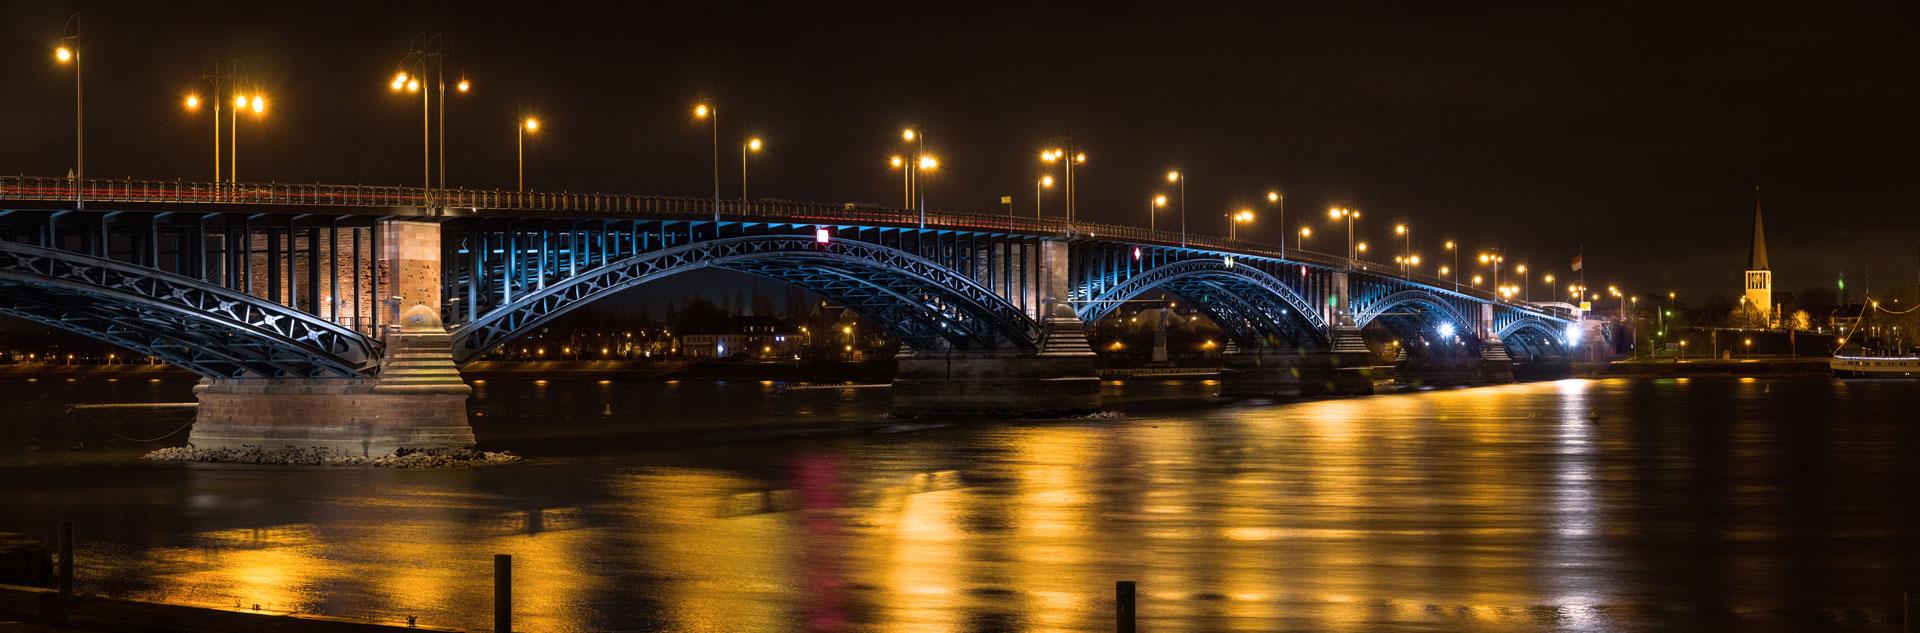 2013_12-Th-Heuss-Brücke-1zu3